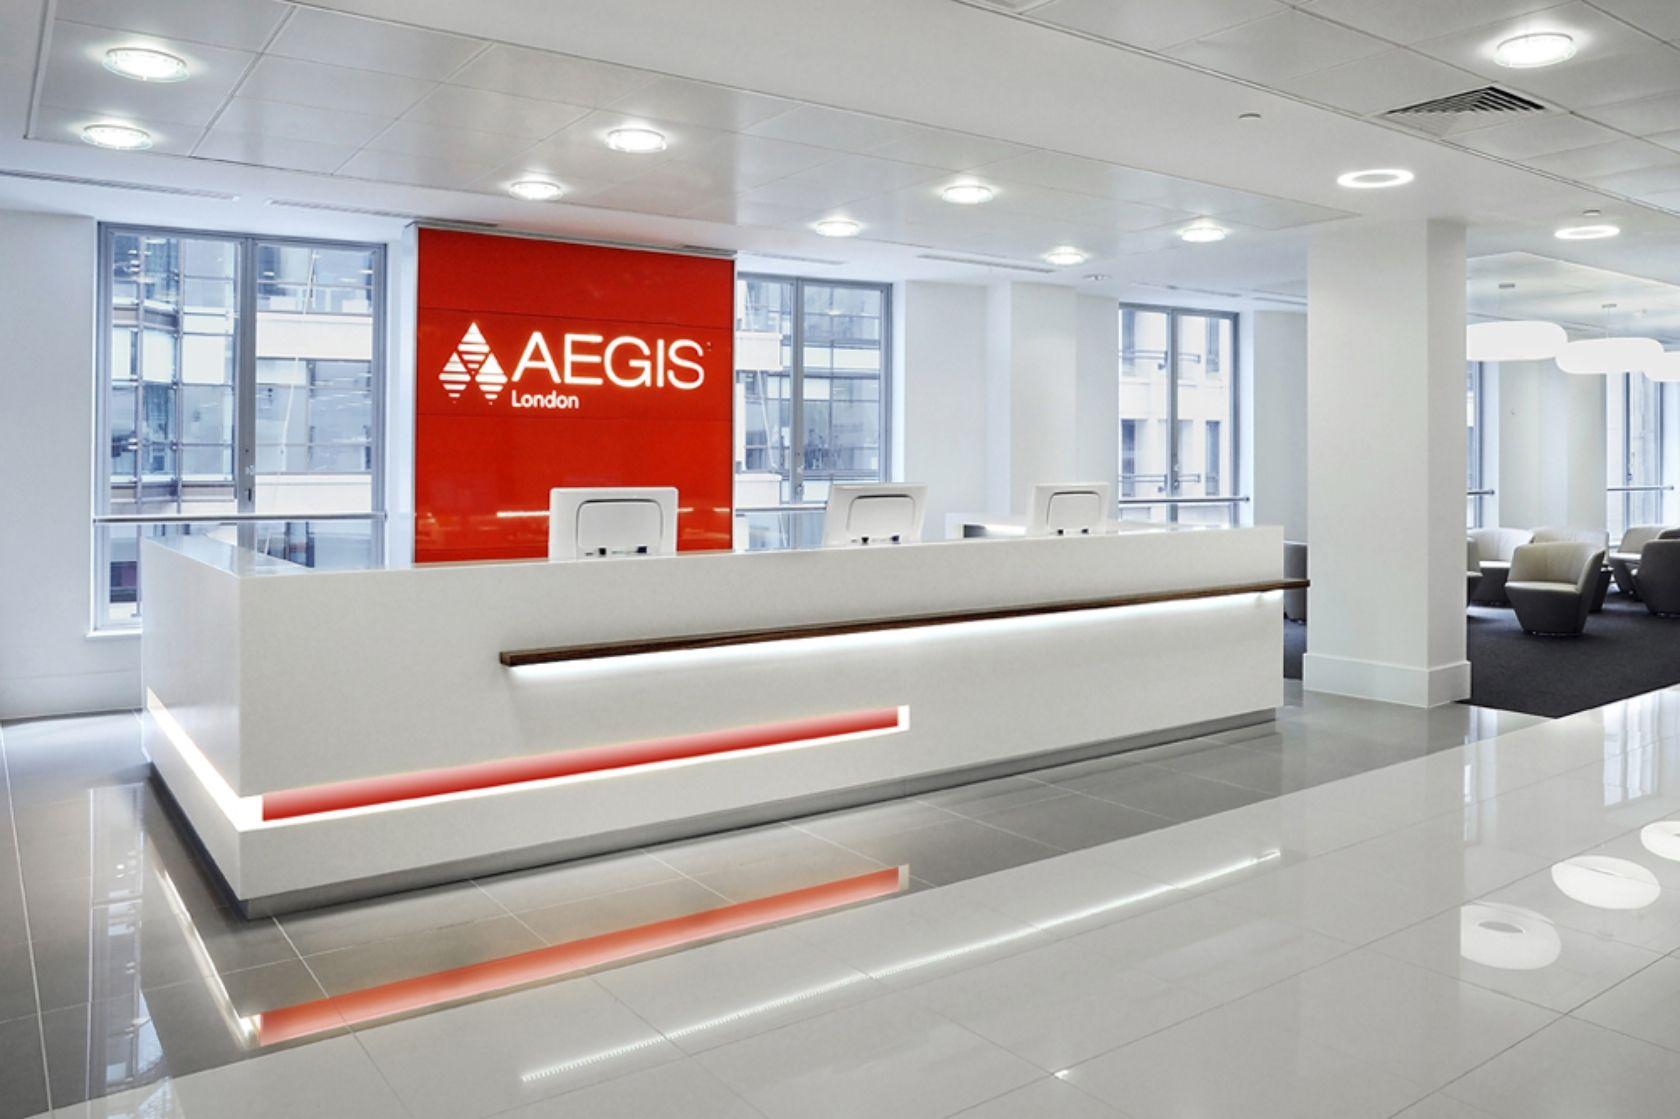 modern office reception design. Office Reception Design Ideas Interior Modern Aegis London Insurance With Sleek White Receptionist Desk And Orange Accent